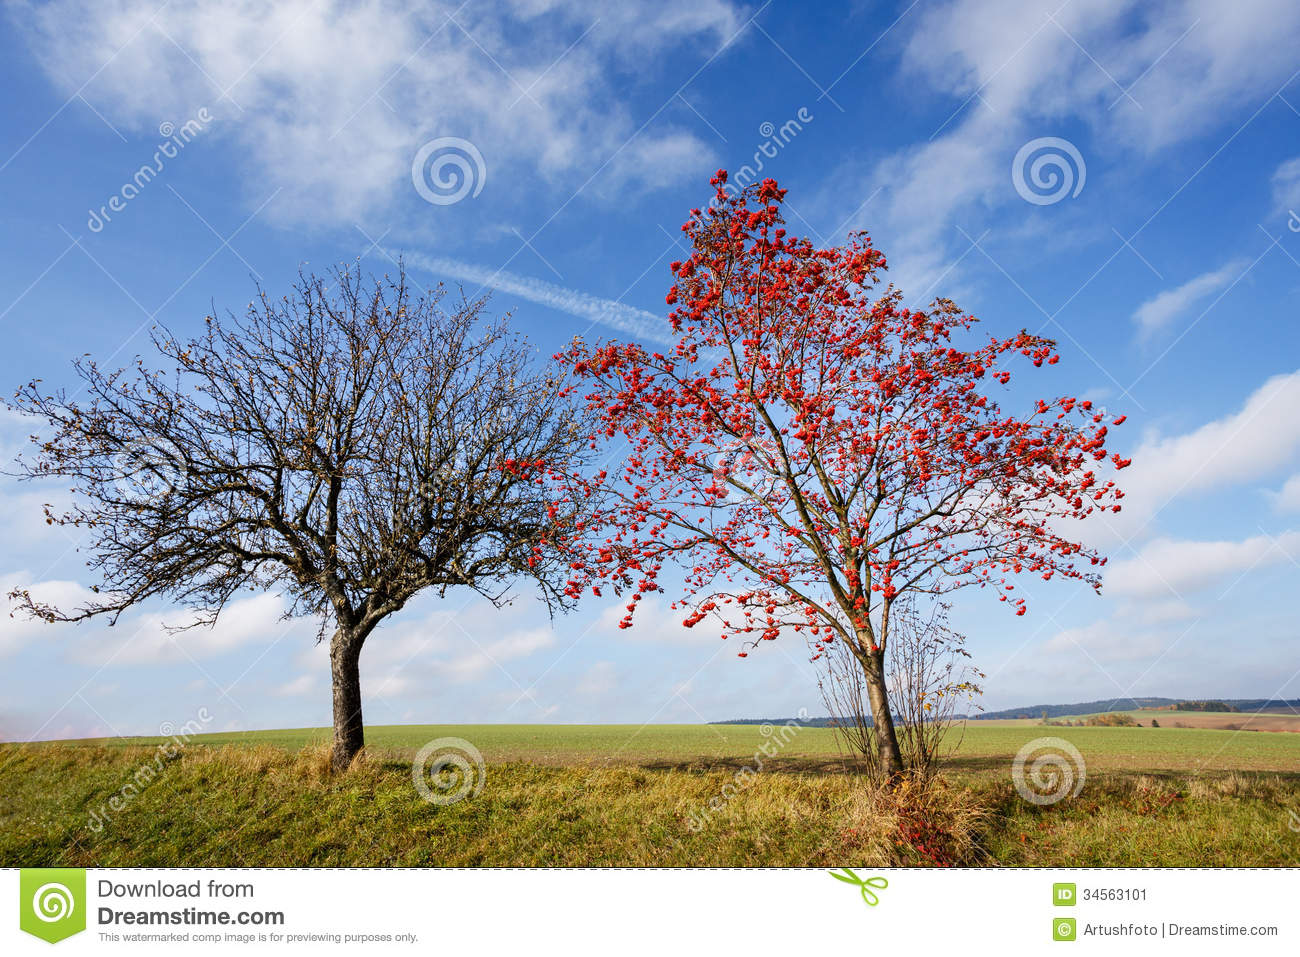 Tree Of Rowan Berries (Sorbus Aucuparia) Stock Image.